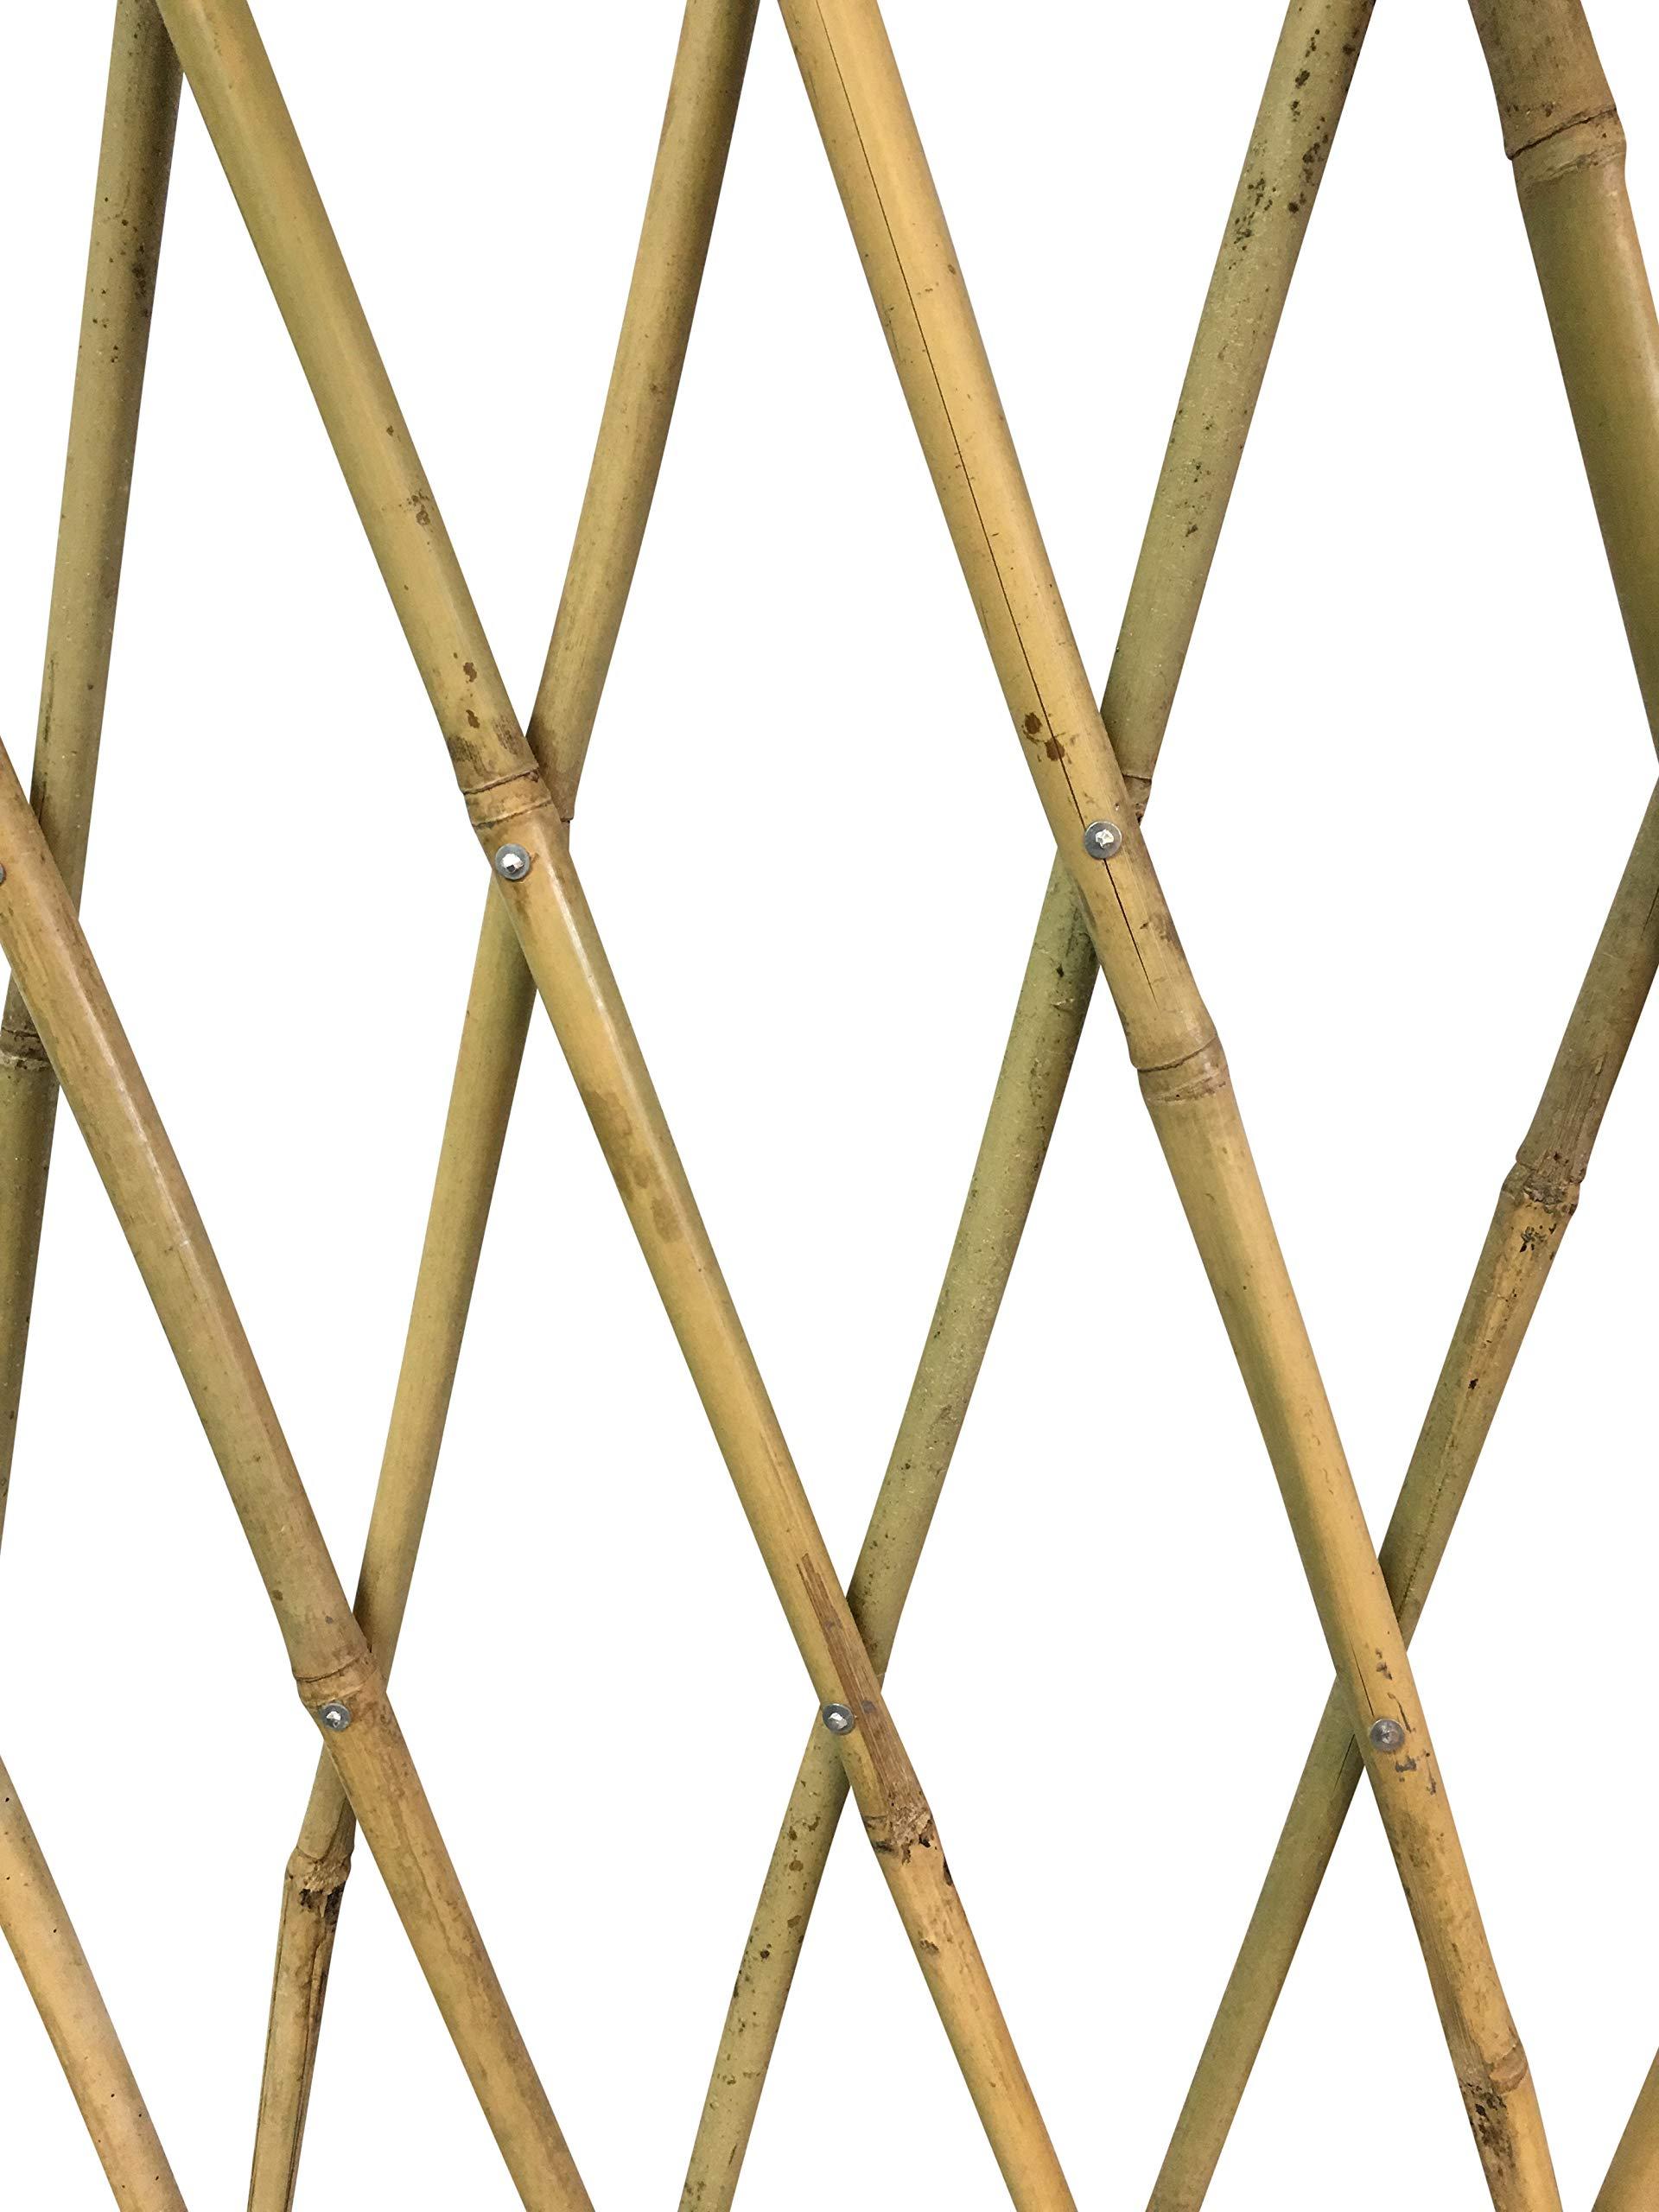 MGP Expandable Bamboo 72L x 12 H Trellis with Aluminum Rivets